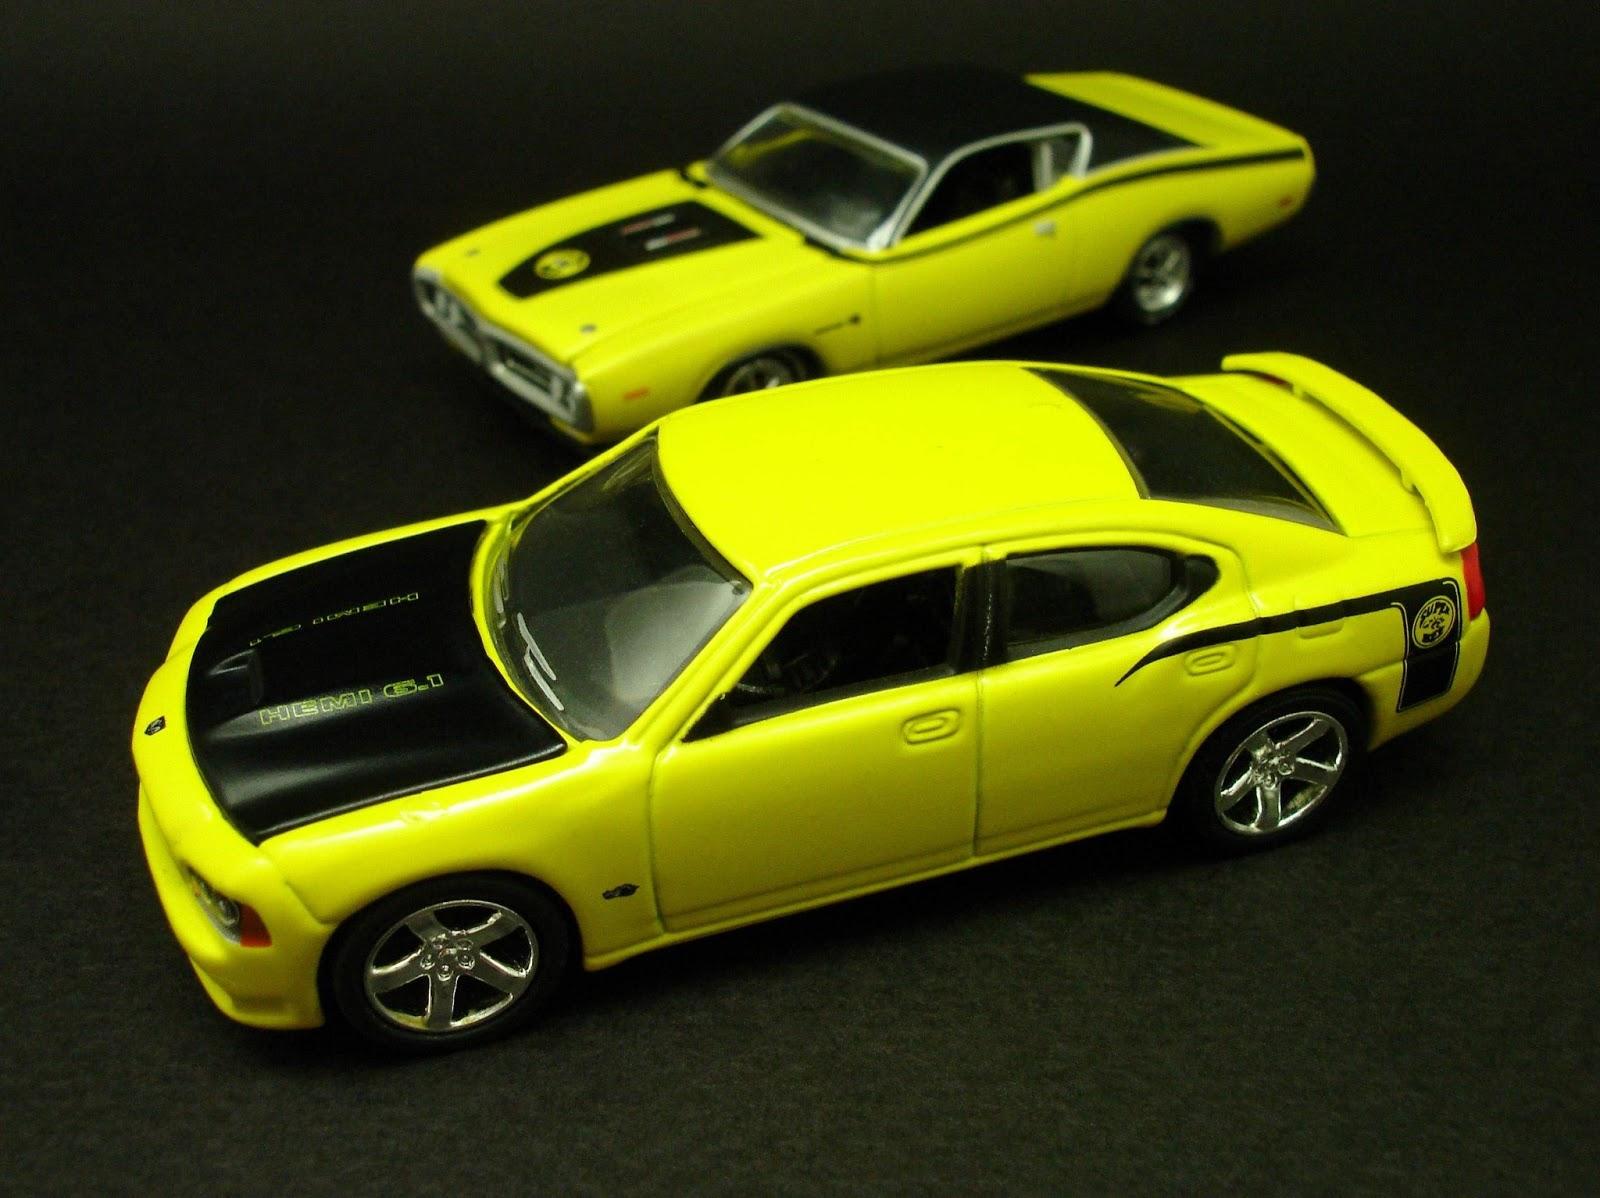 Diecast Hobbist Custom 2007 Dodge Charger Srt8 Super Bee